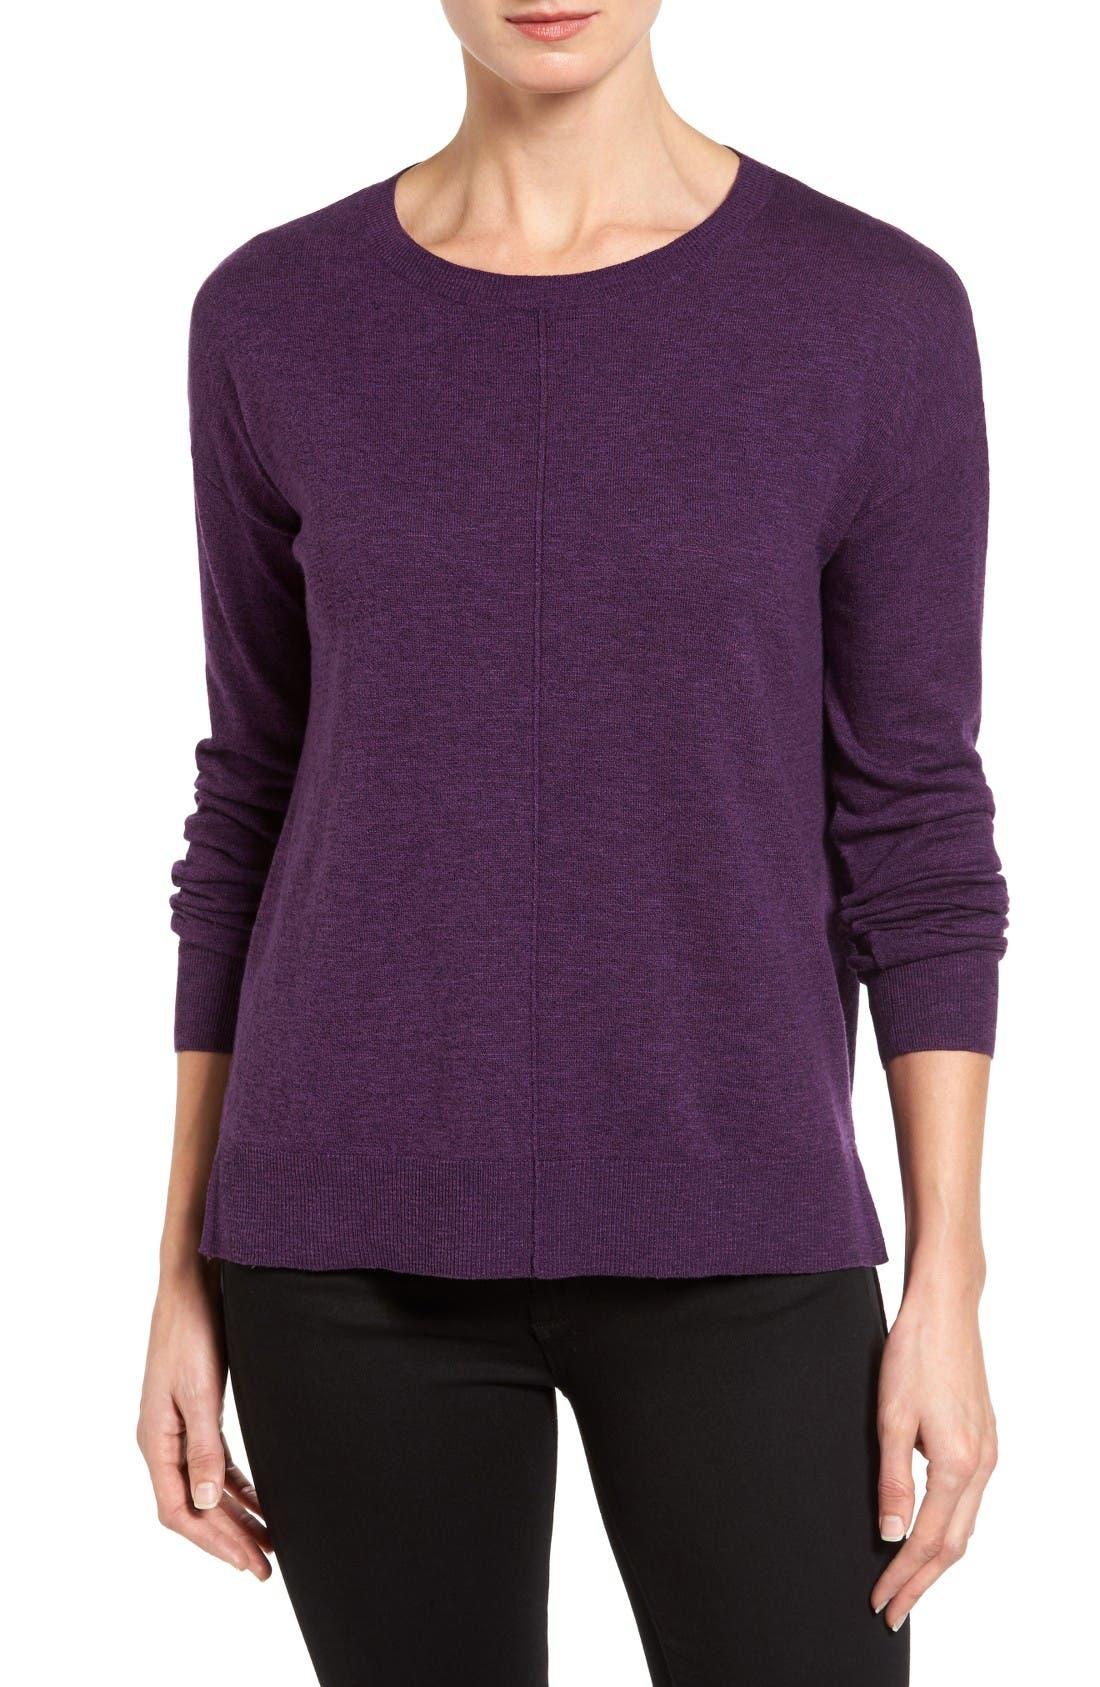 Alternate Image 1 Selected - Halogen® Seam Detail High/Low Sweater (Regular & Petite)